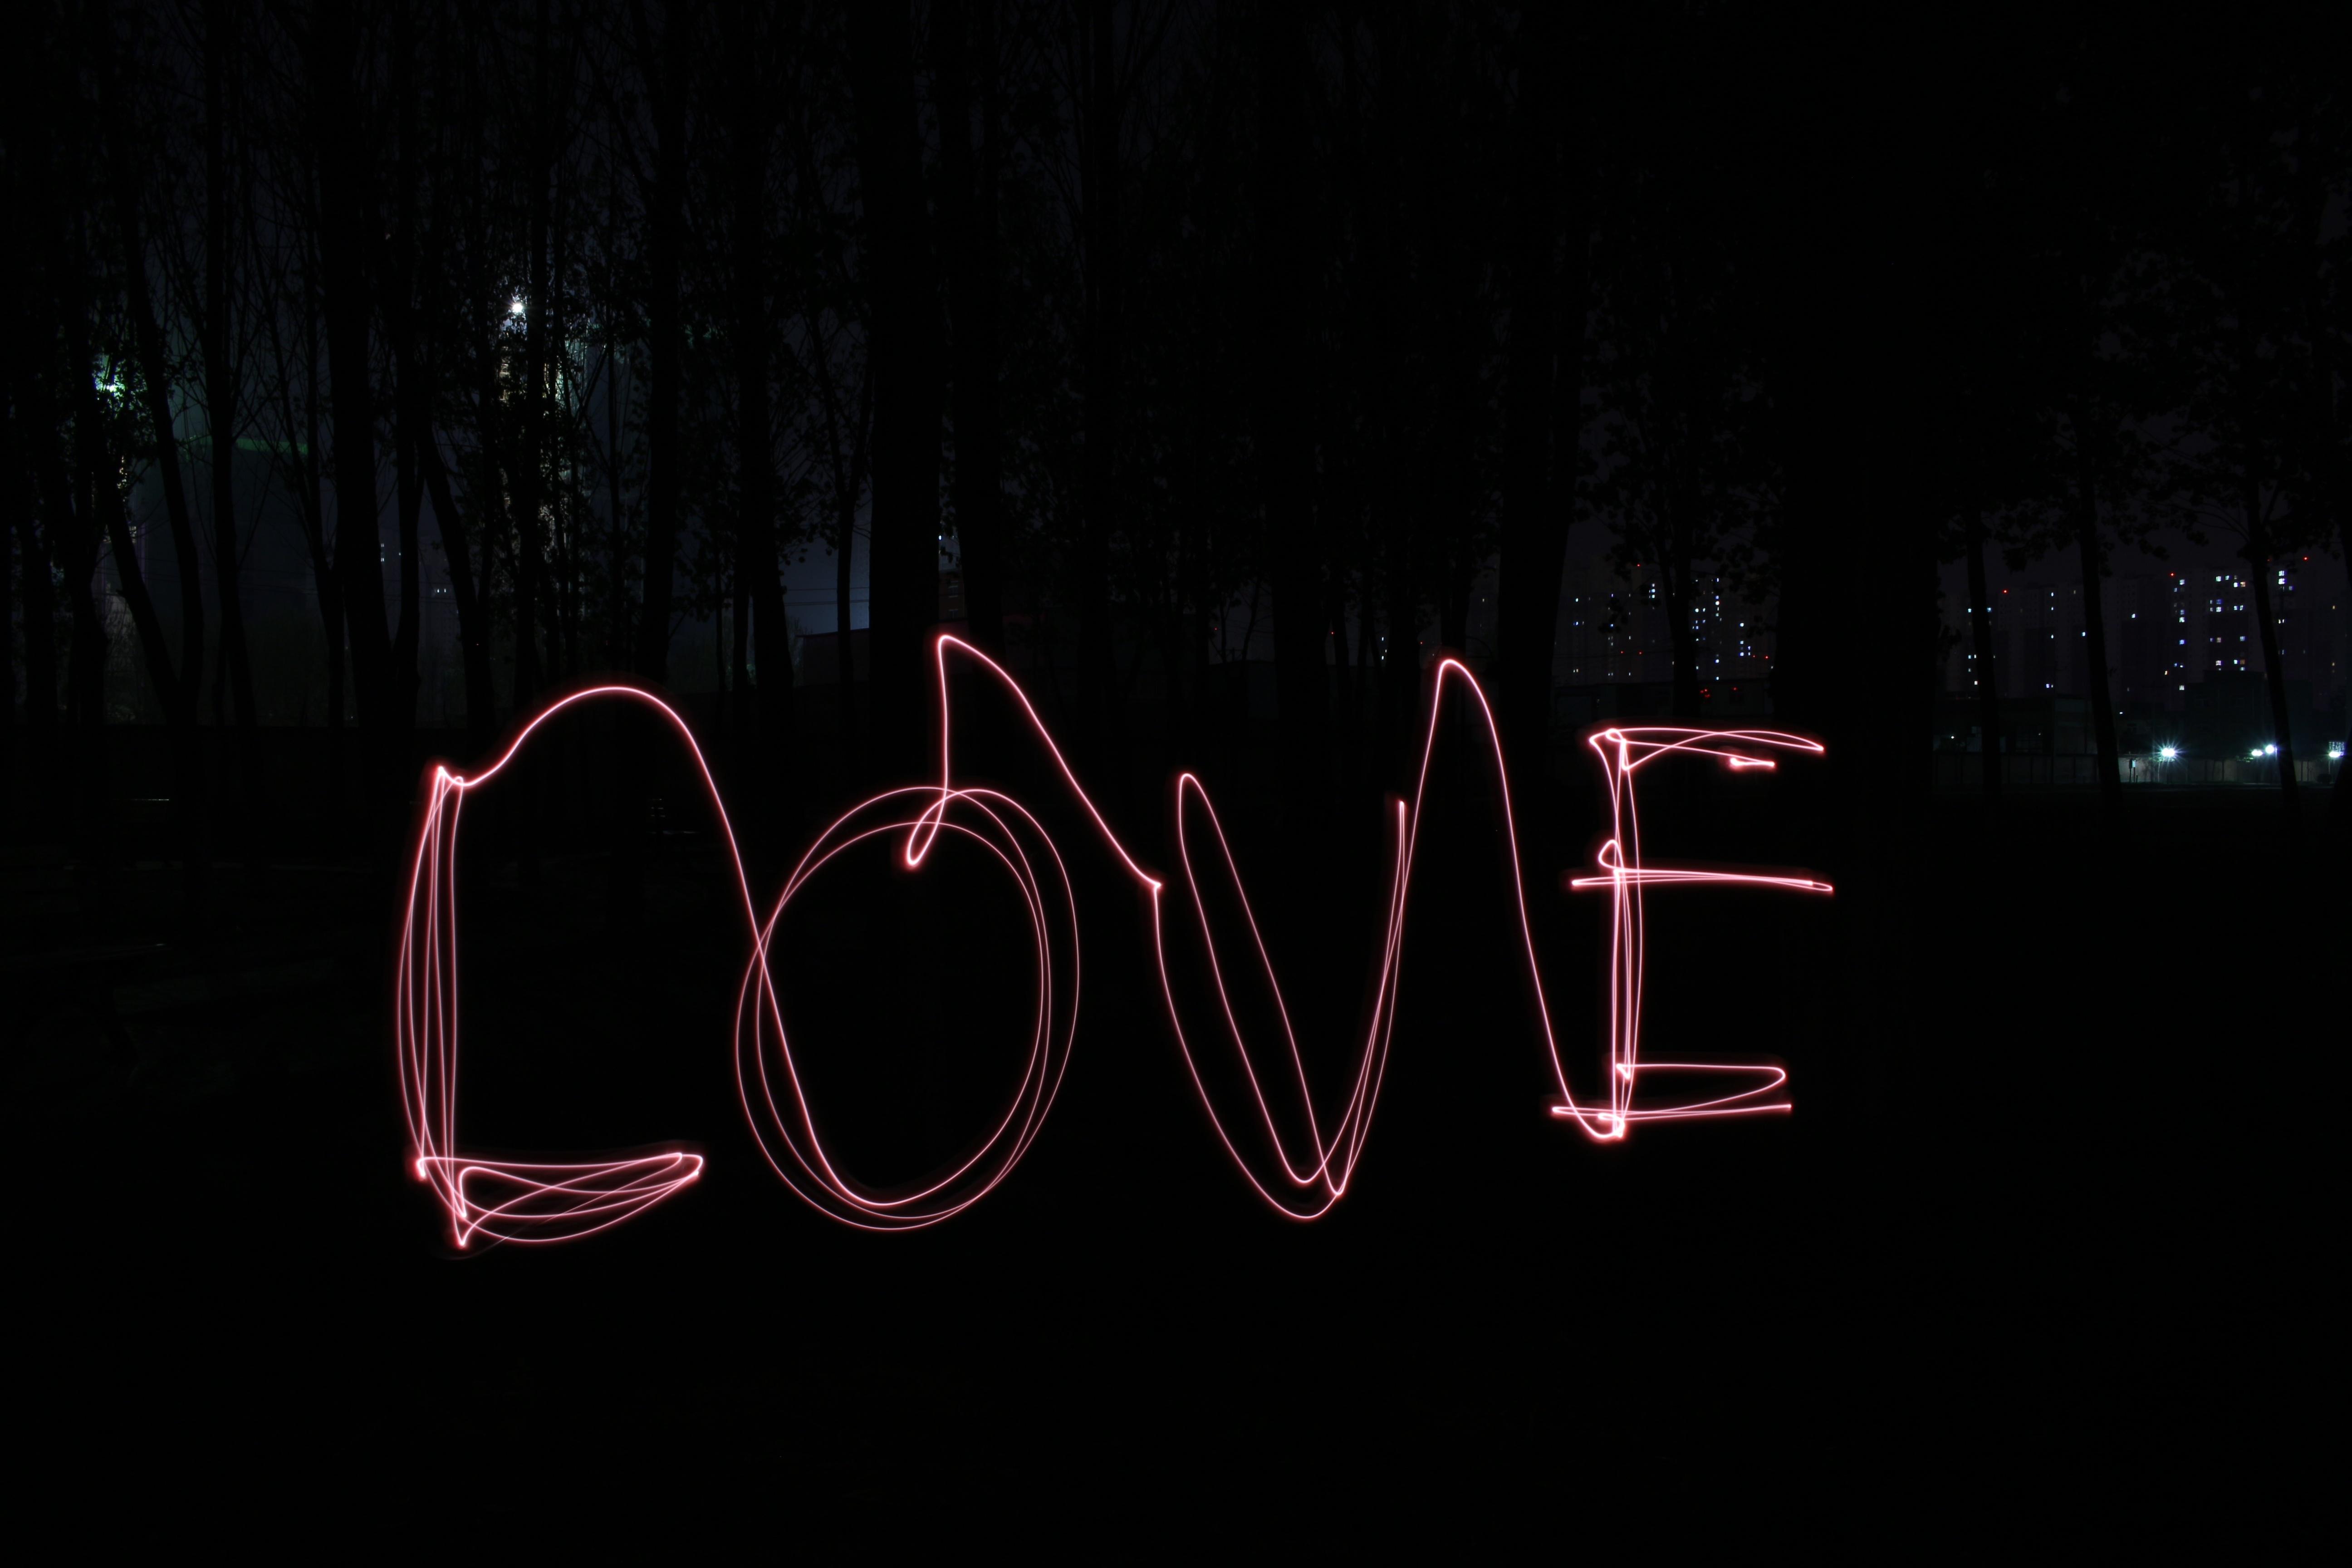 Gambar Kata Malam Jumlah Cinta Garis Merah Kegelapan